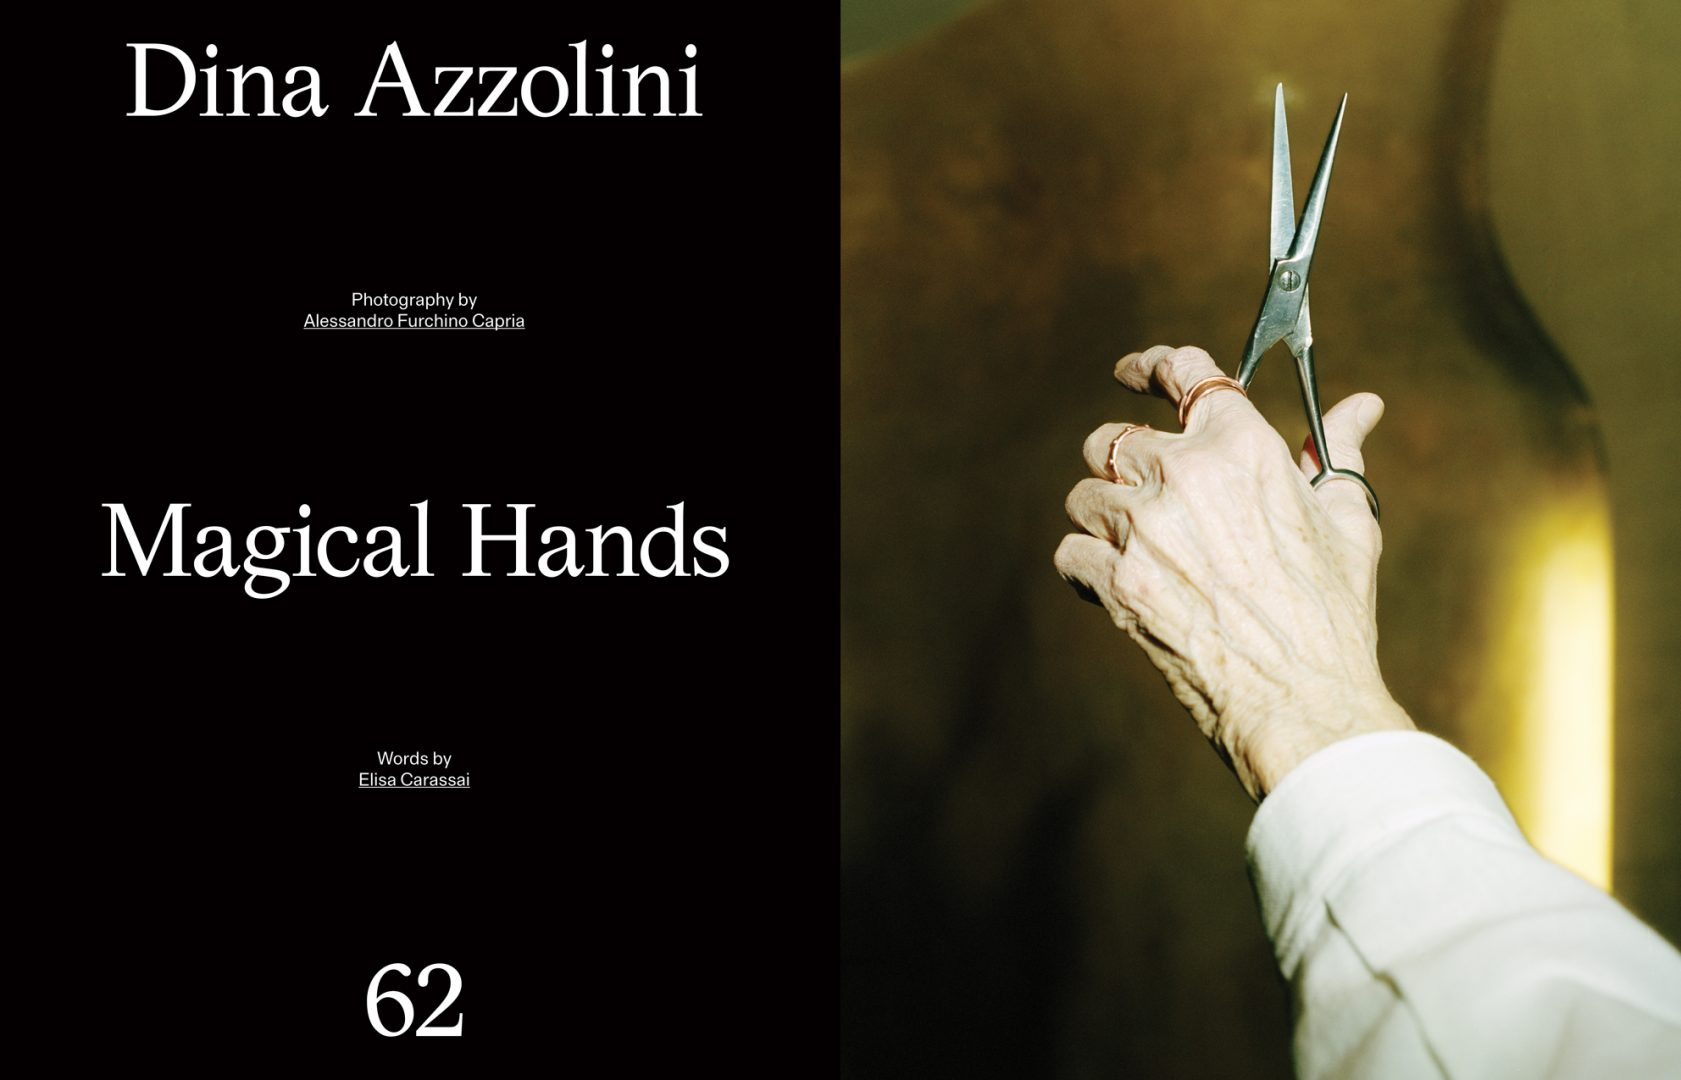 Sali e Tabacchi Journal, Photographed by Alessandro Furchino Capria